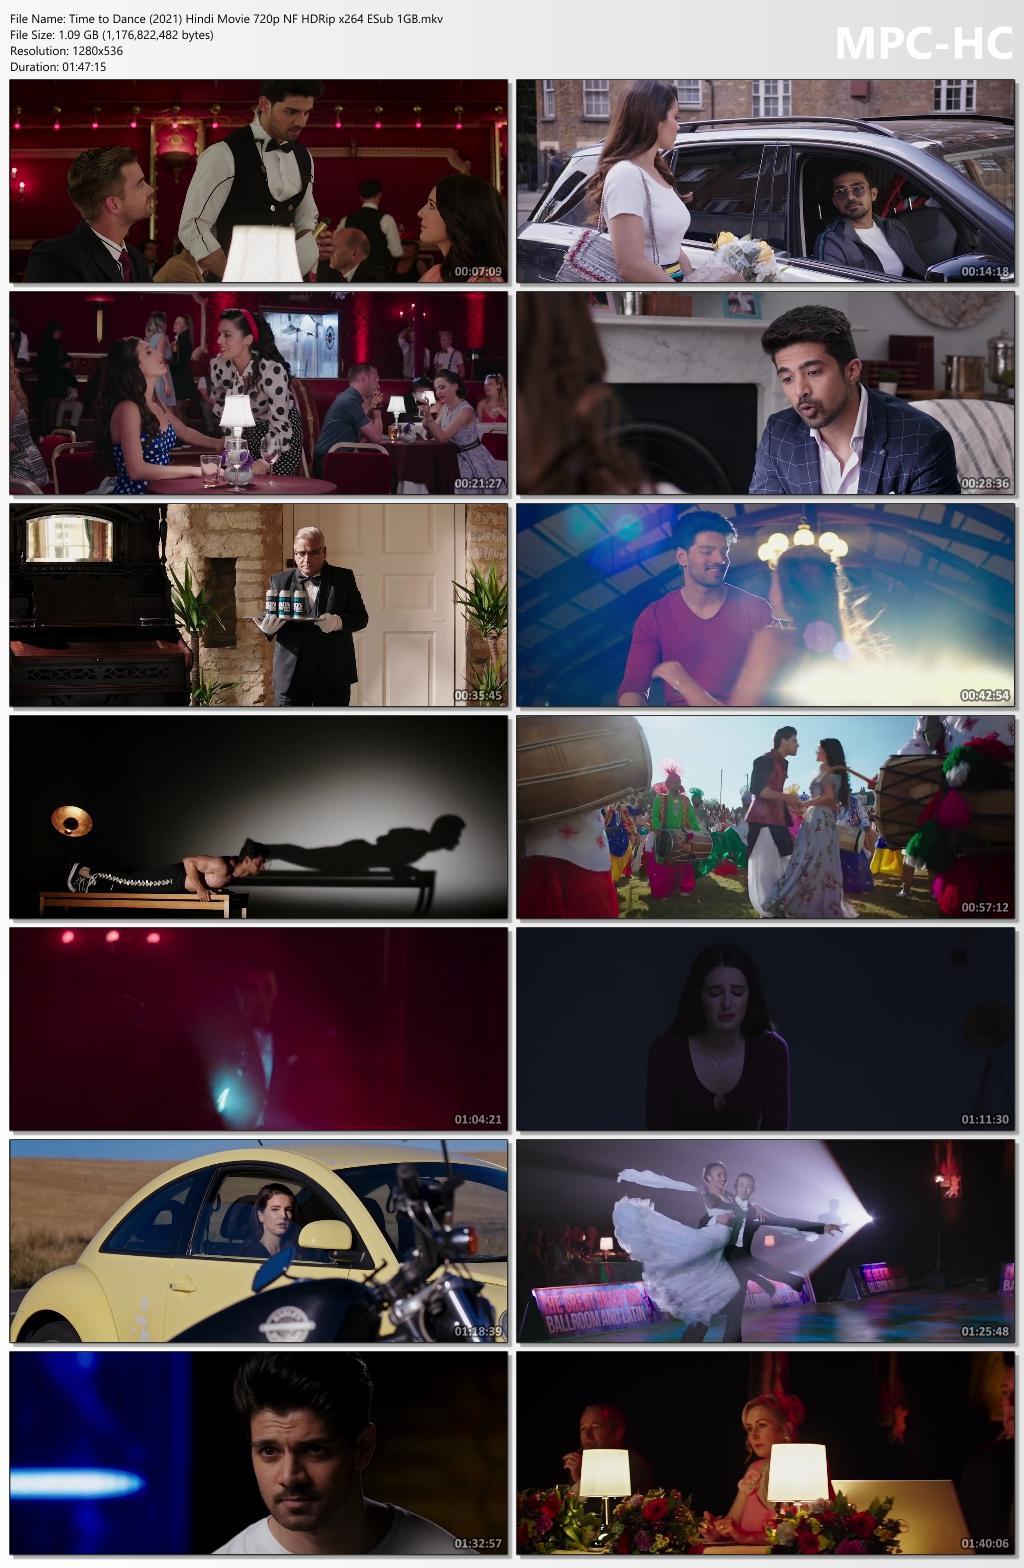 Time-to-Dance-2021-Hindi-Movie-720p-NF-HDRip-x264-ESub-1-GB-mkv-thumbs